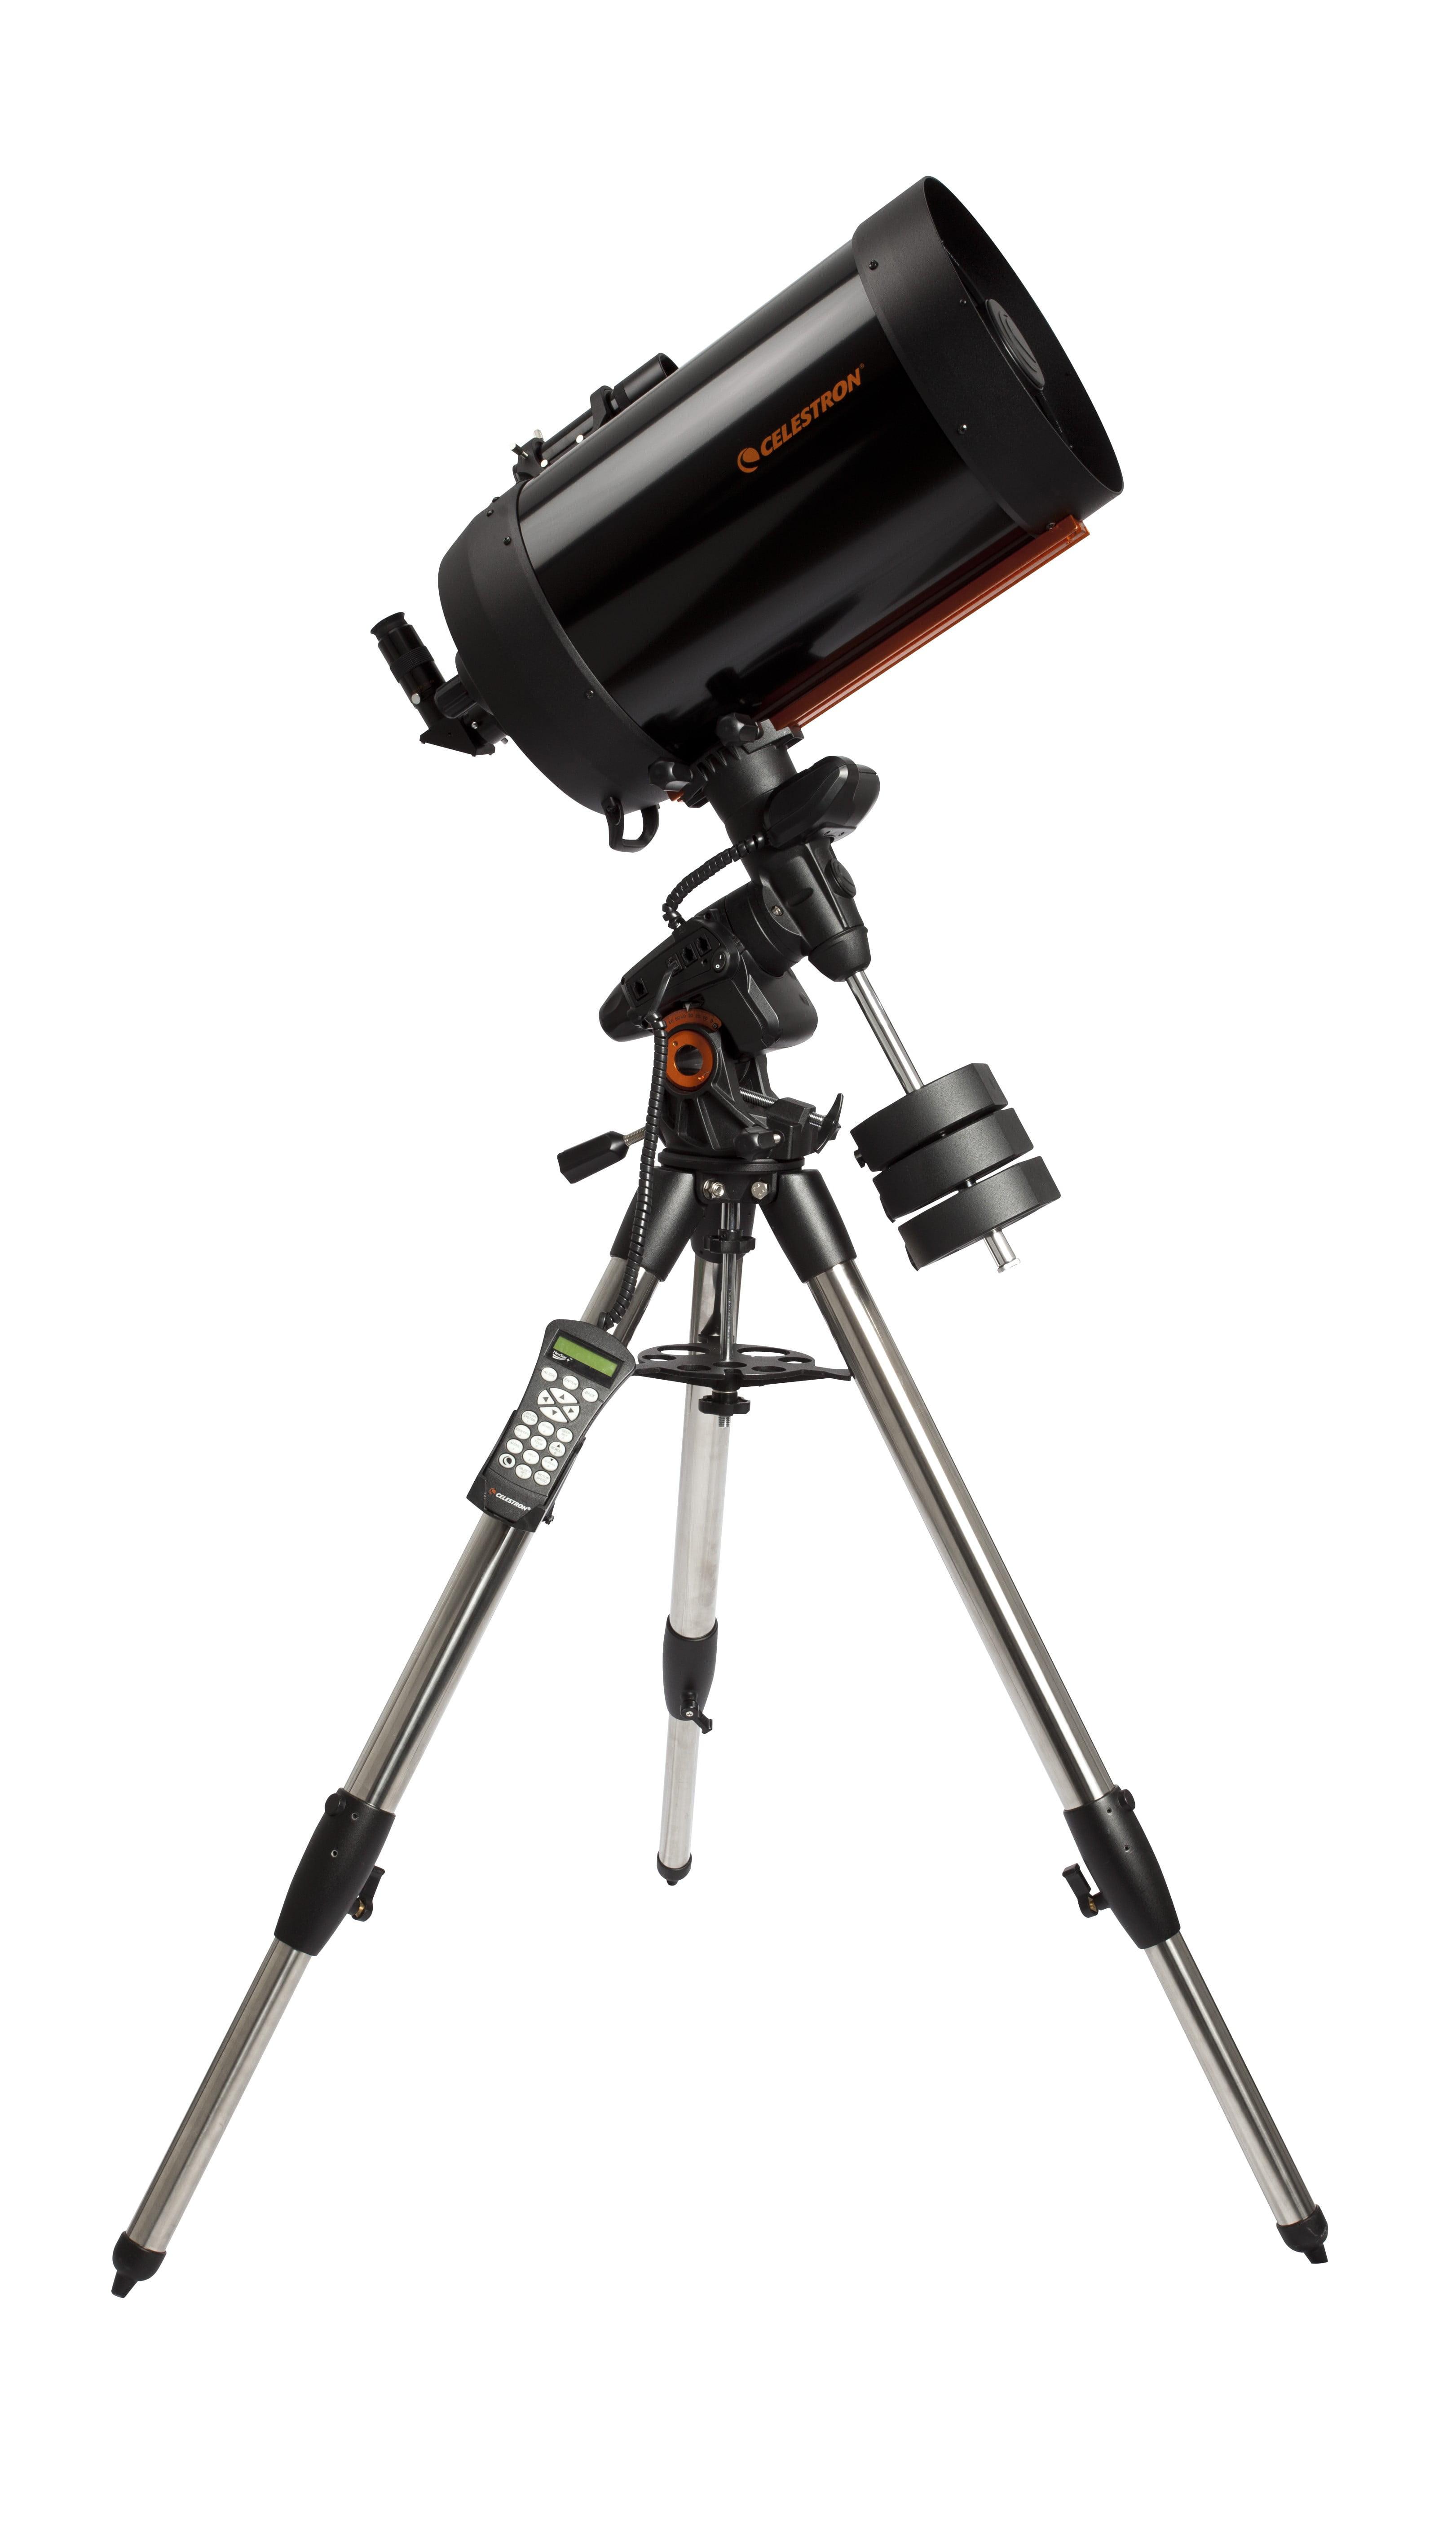 "Celestron Advanced VX 11"" f 10 Schmidt-Cassegrain Telescope by Celestron International"